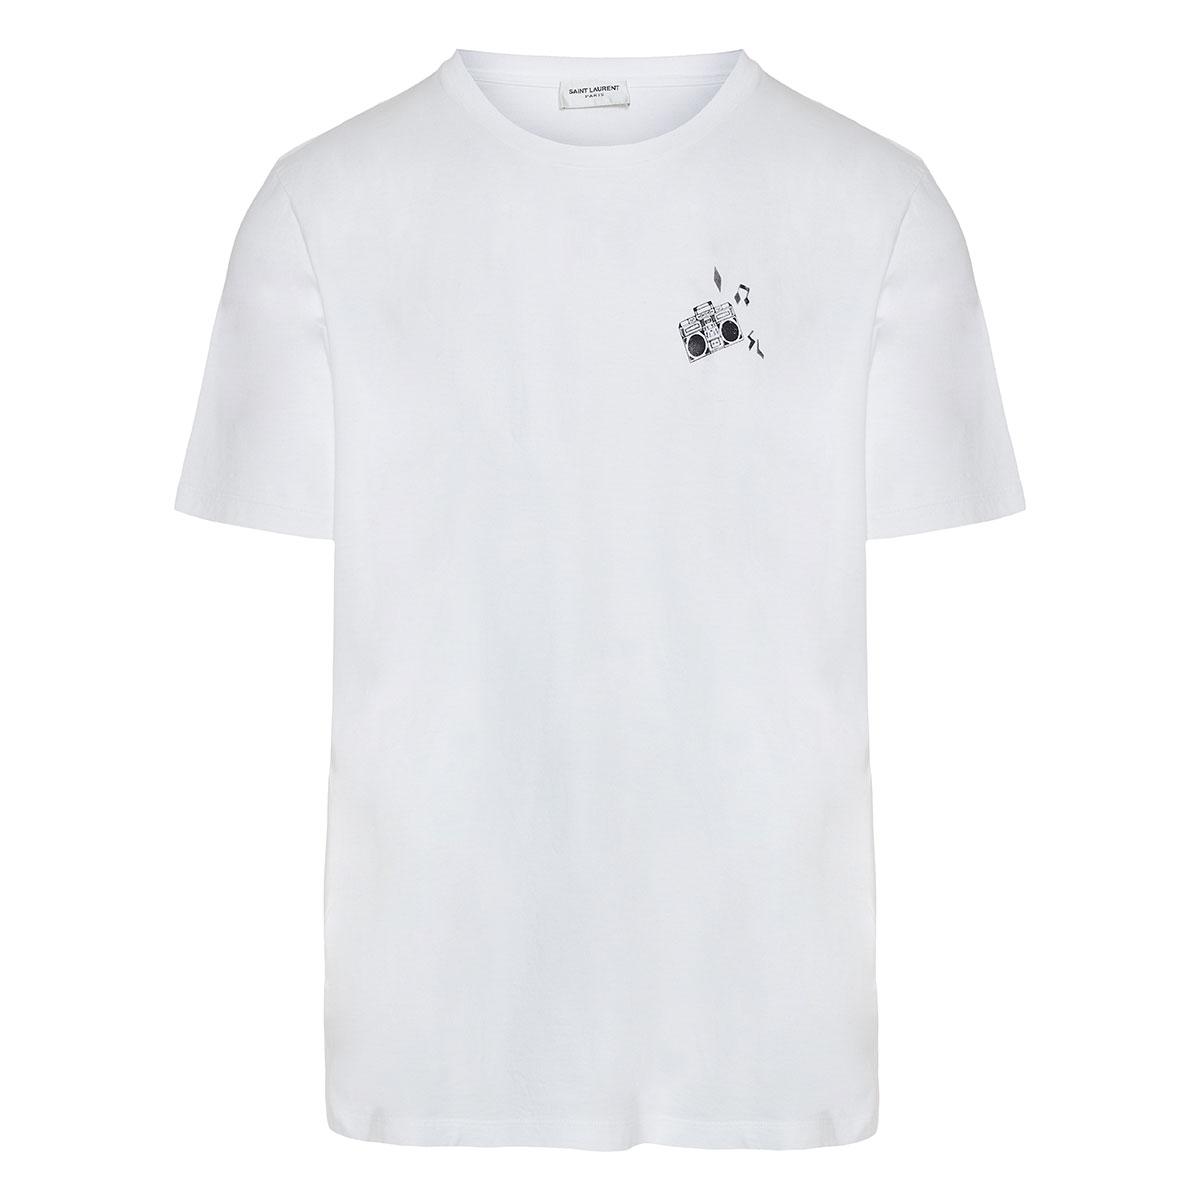 Boombox-print cotton t-shirt